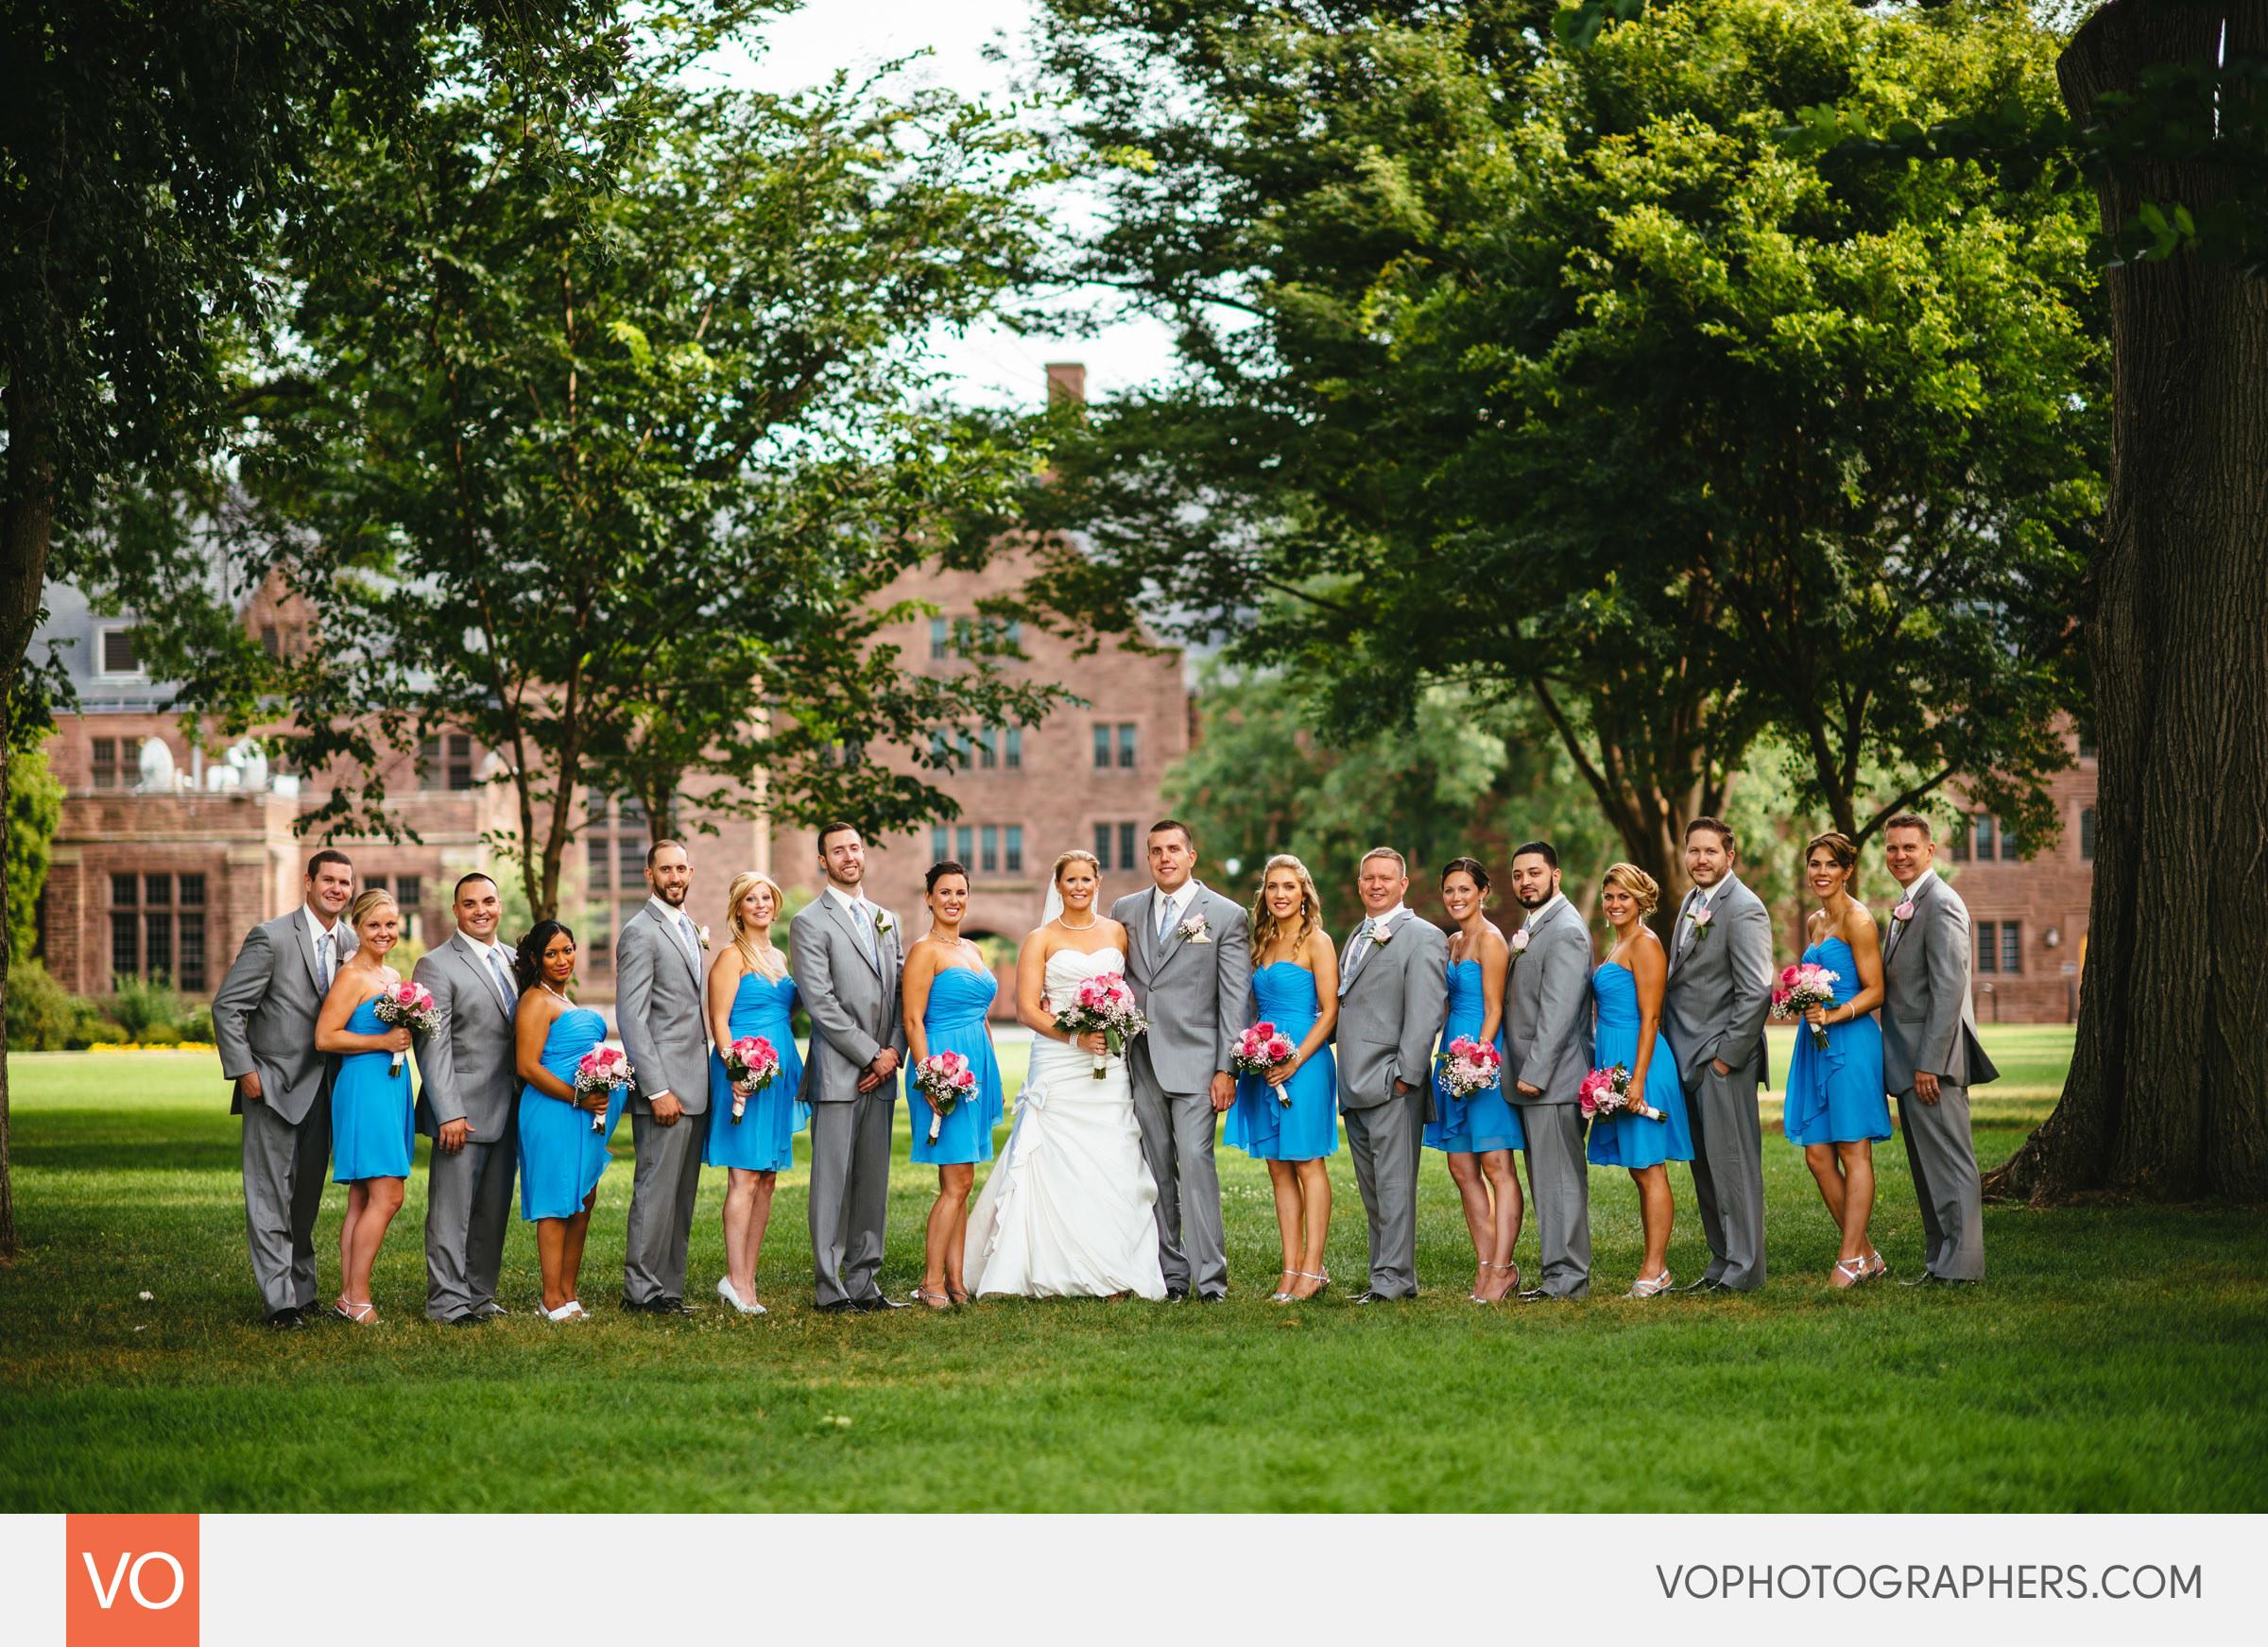 Doubletree-Hotel-Bristol-Wedding-Cathy-Chris-0016